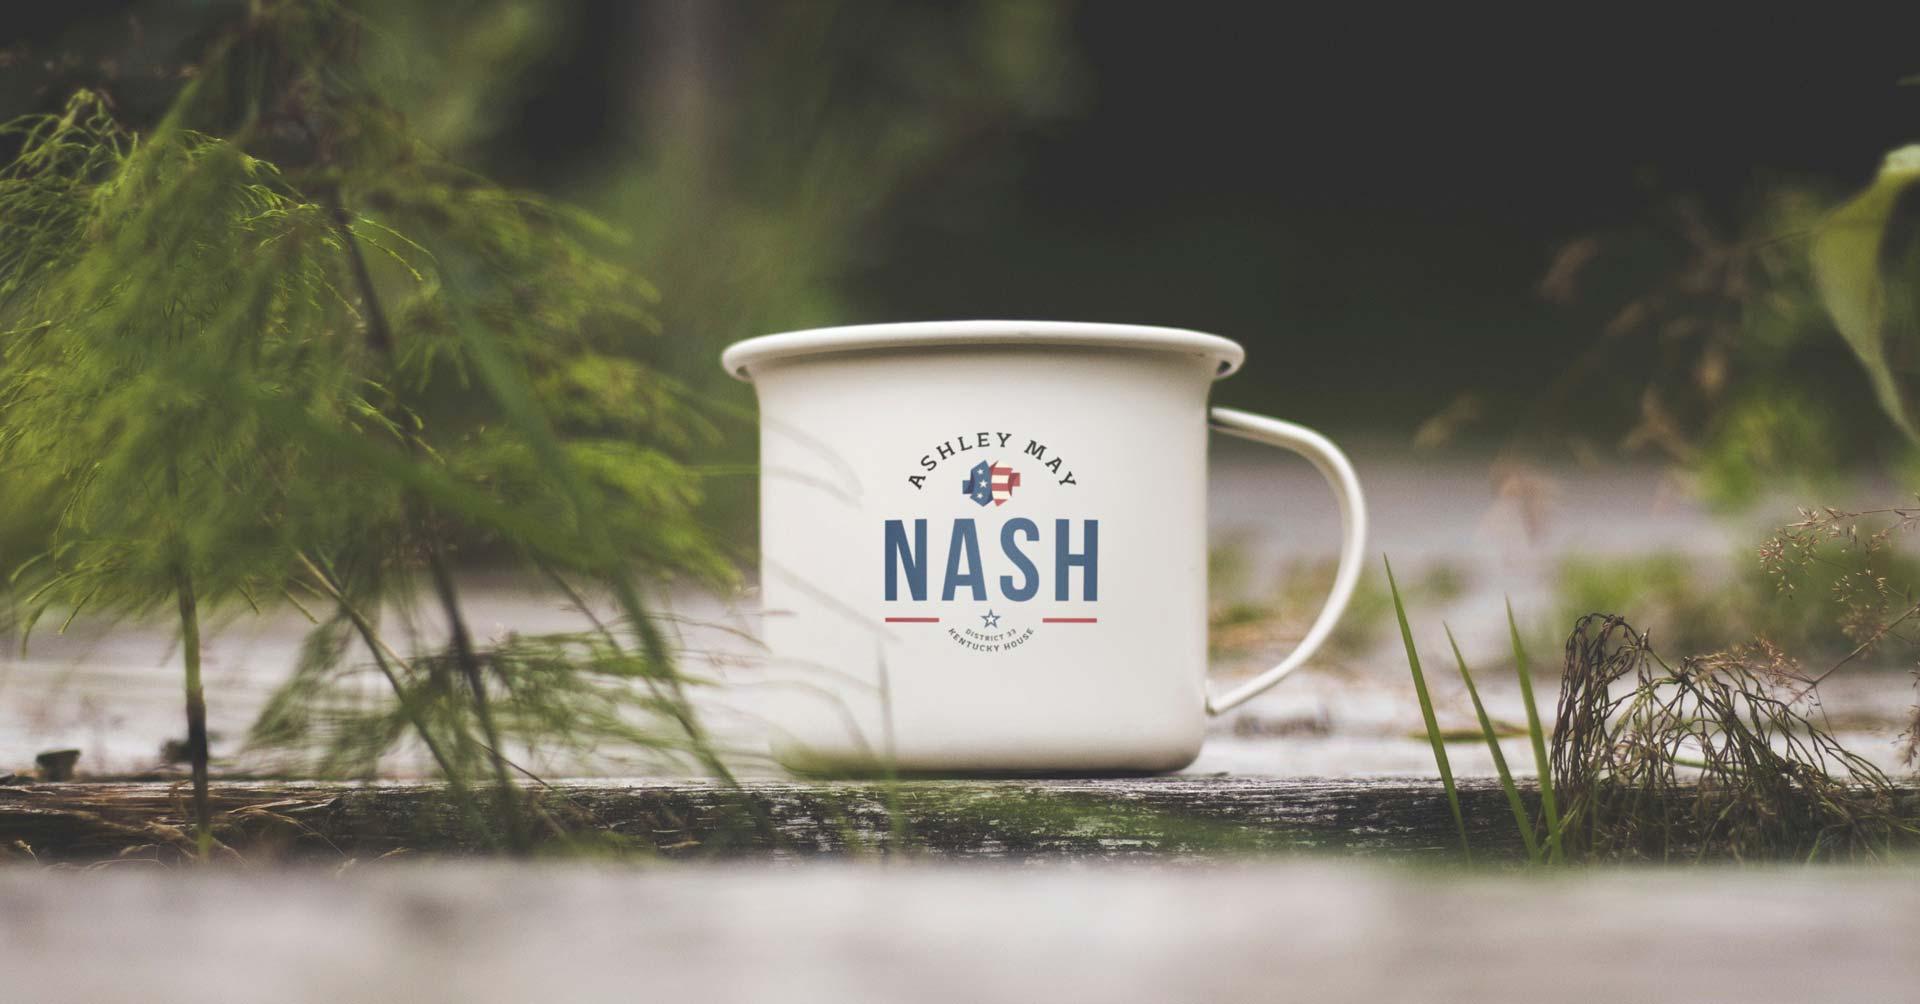 Ashley May Nash Mug Concept